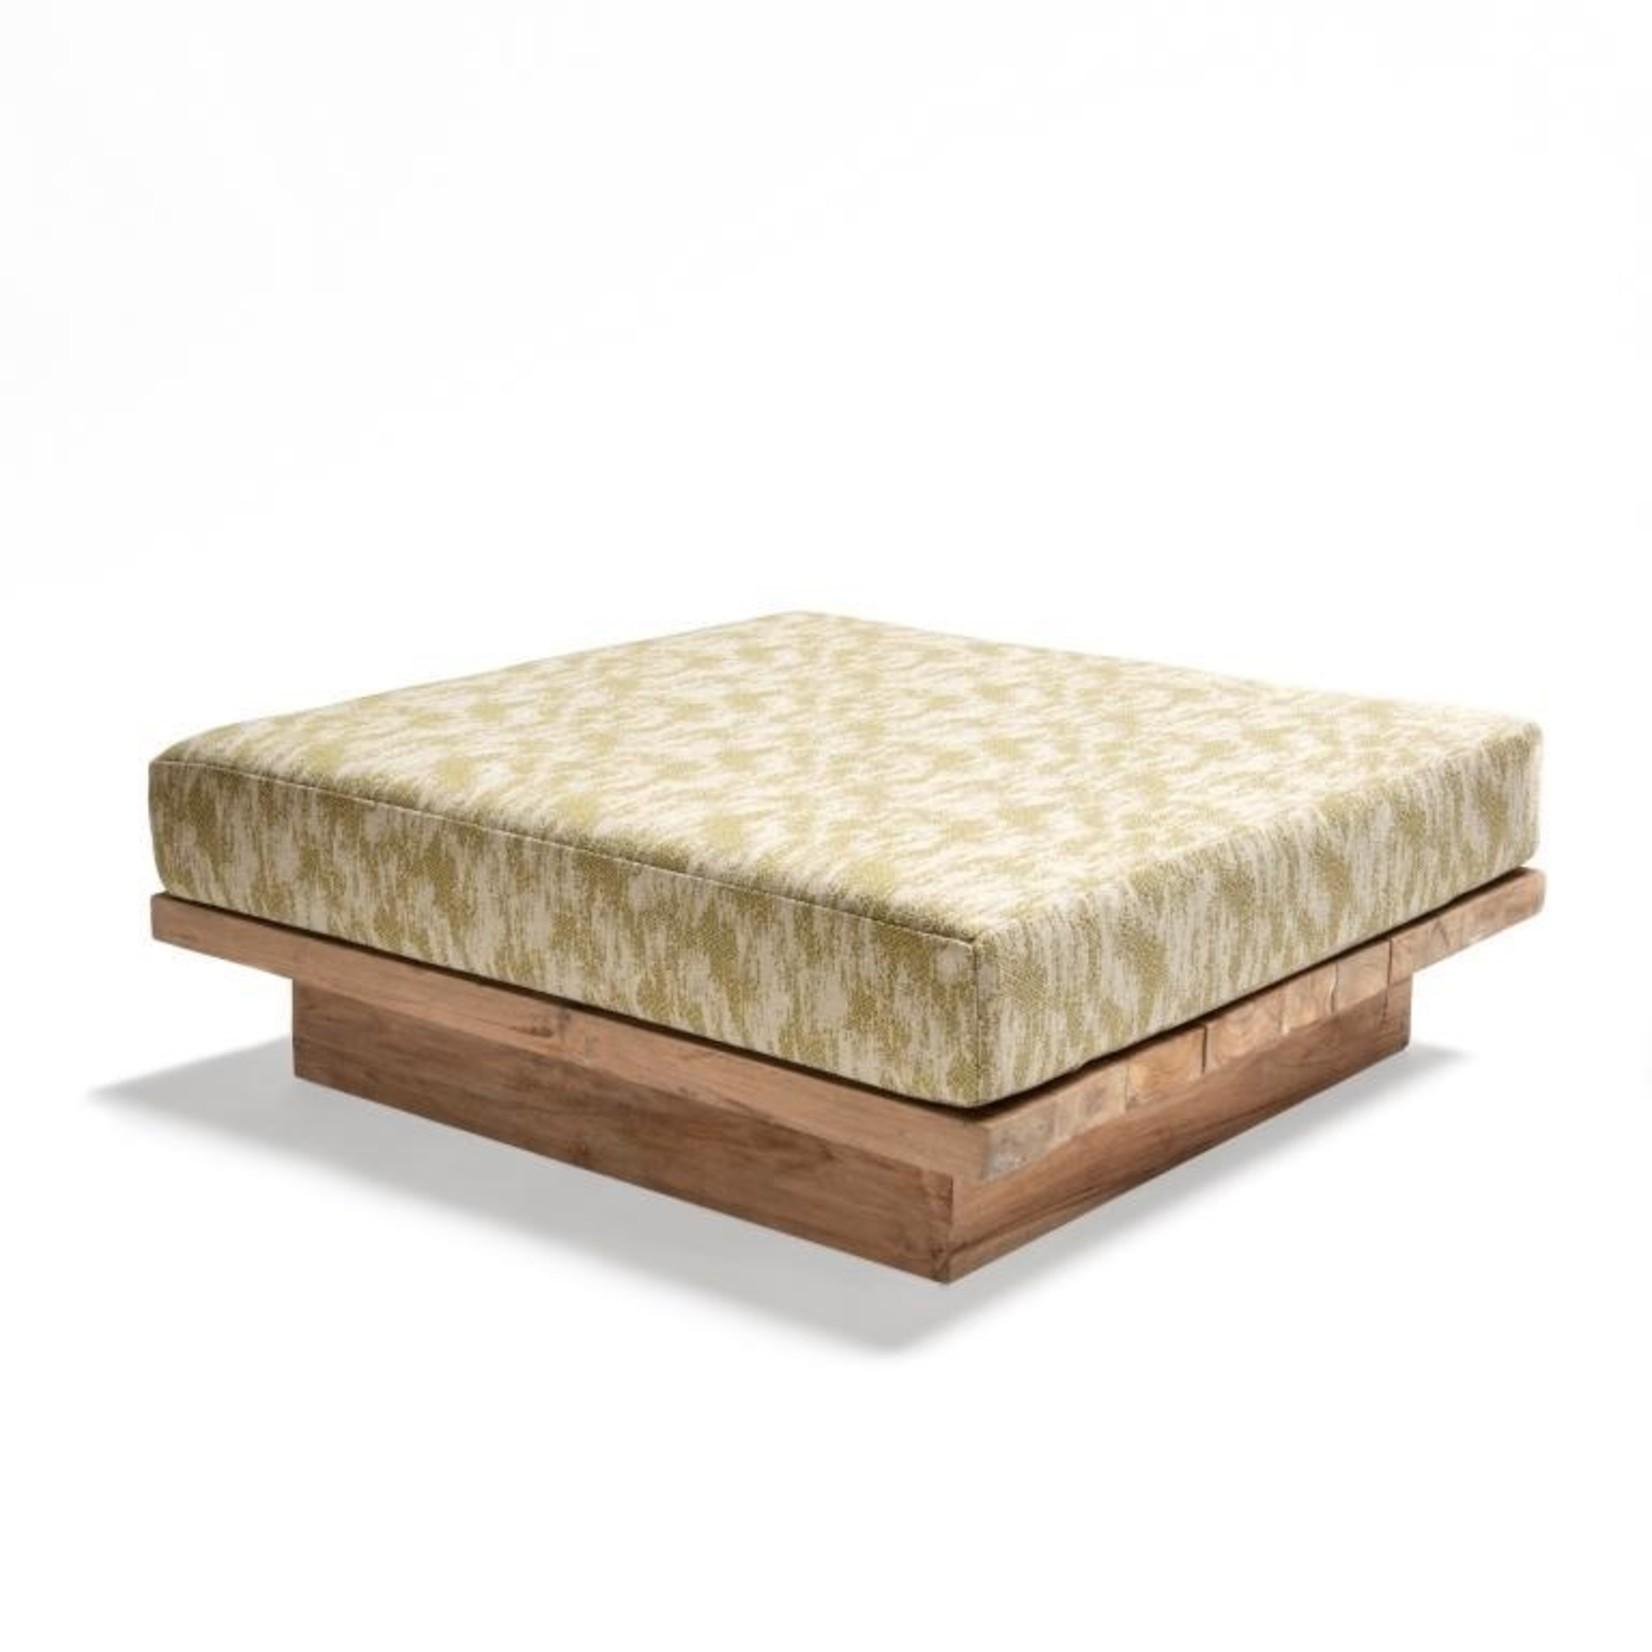 Gommaire Ottoman Magnus   Reclaimed Teak Natural Gray + Cushion